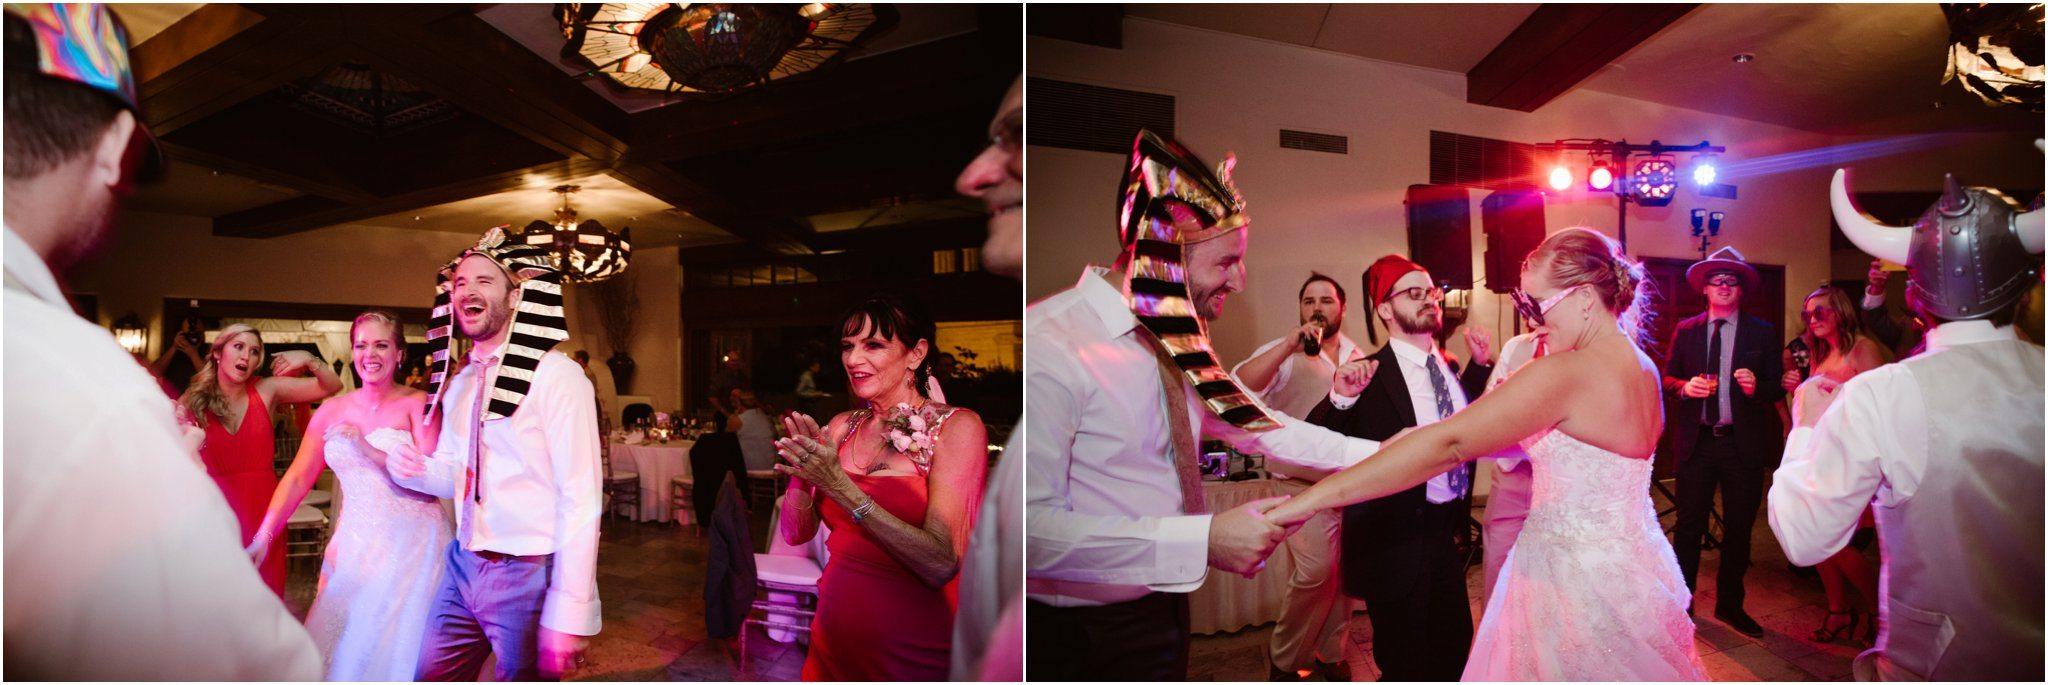 0090albuquerque-wedding-photographer_-santa-fe-wedding-photographer_-southwest-wedding-photography_-blue-rose-studio